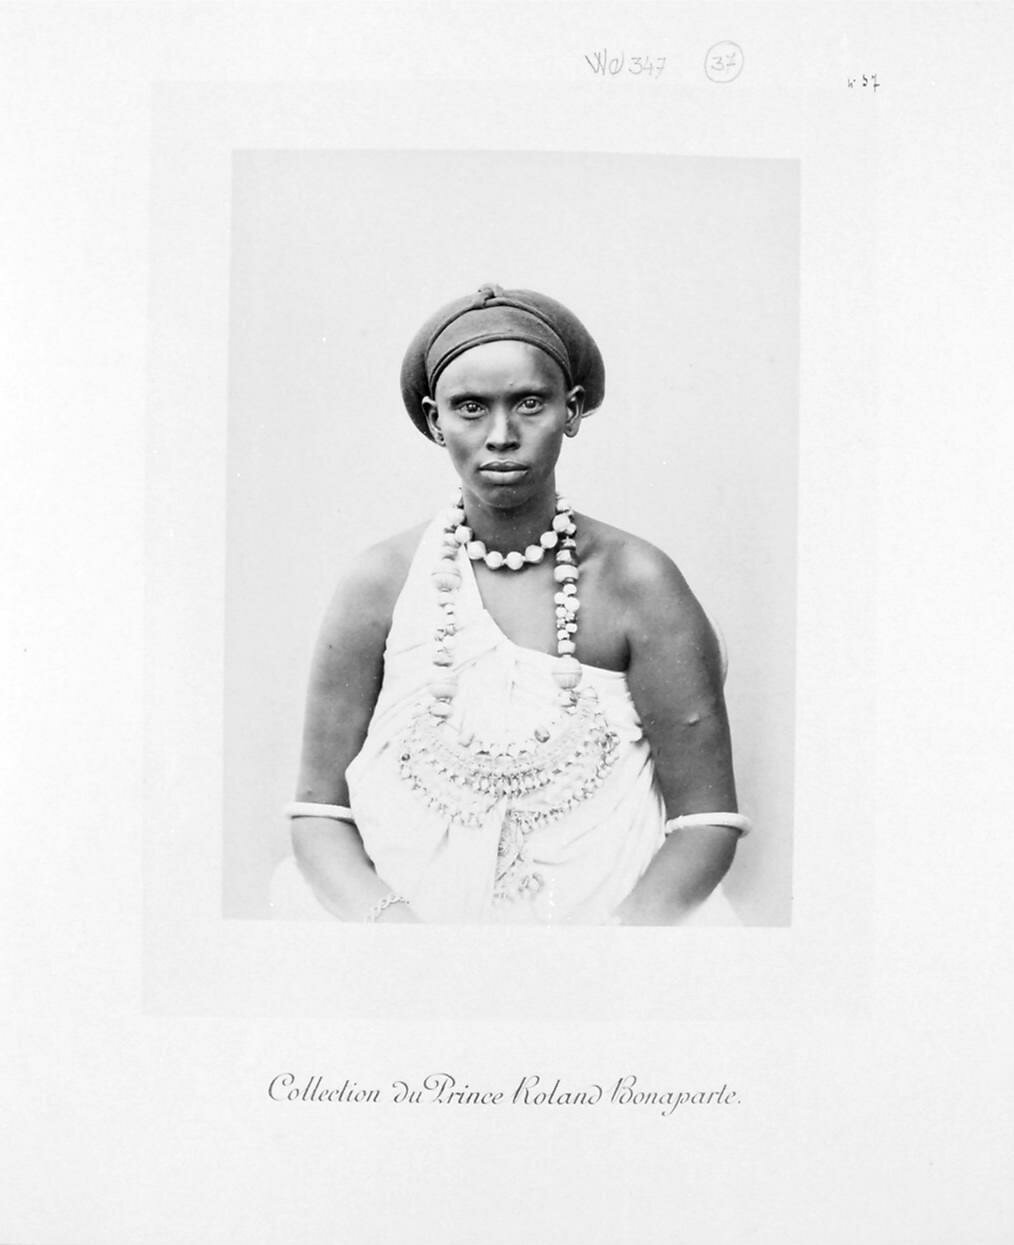 Дахабо Херси, племя Тол-джеэло, 24 лет